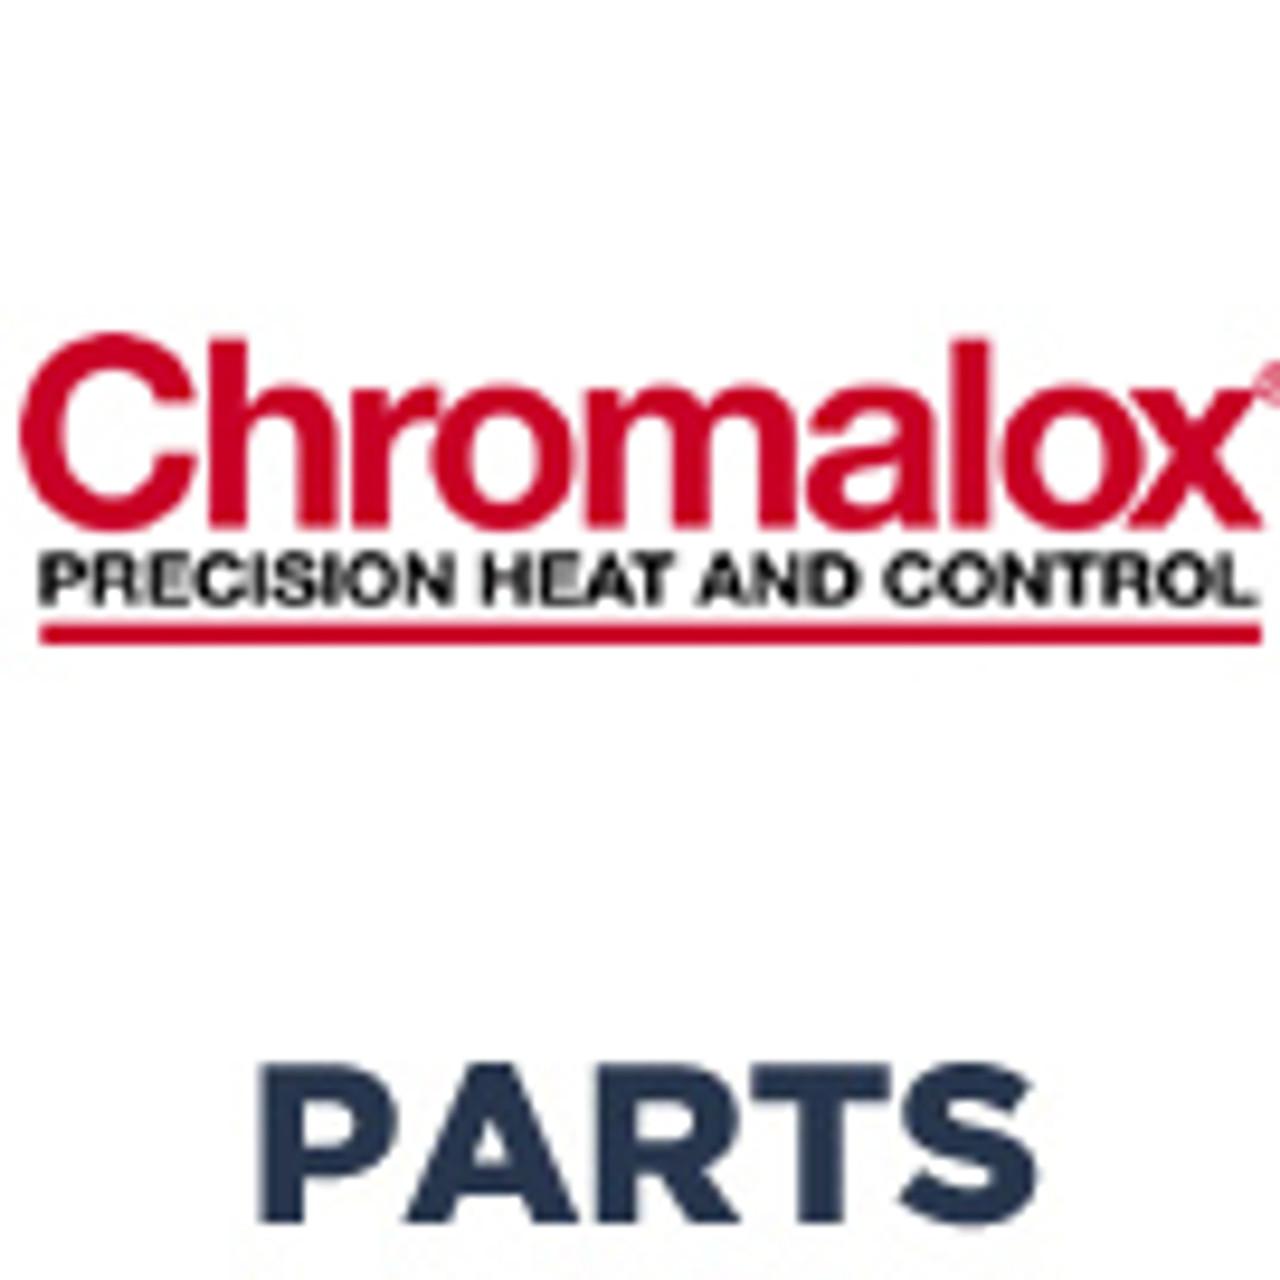 Chromalox Parts